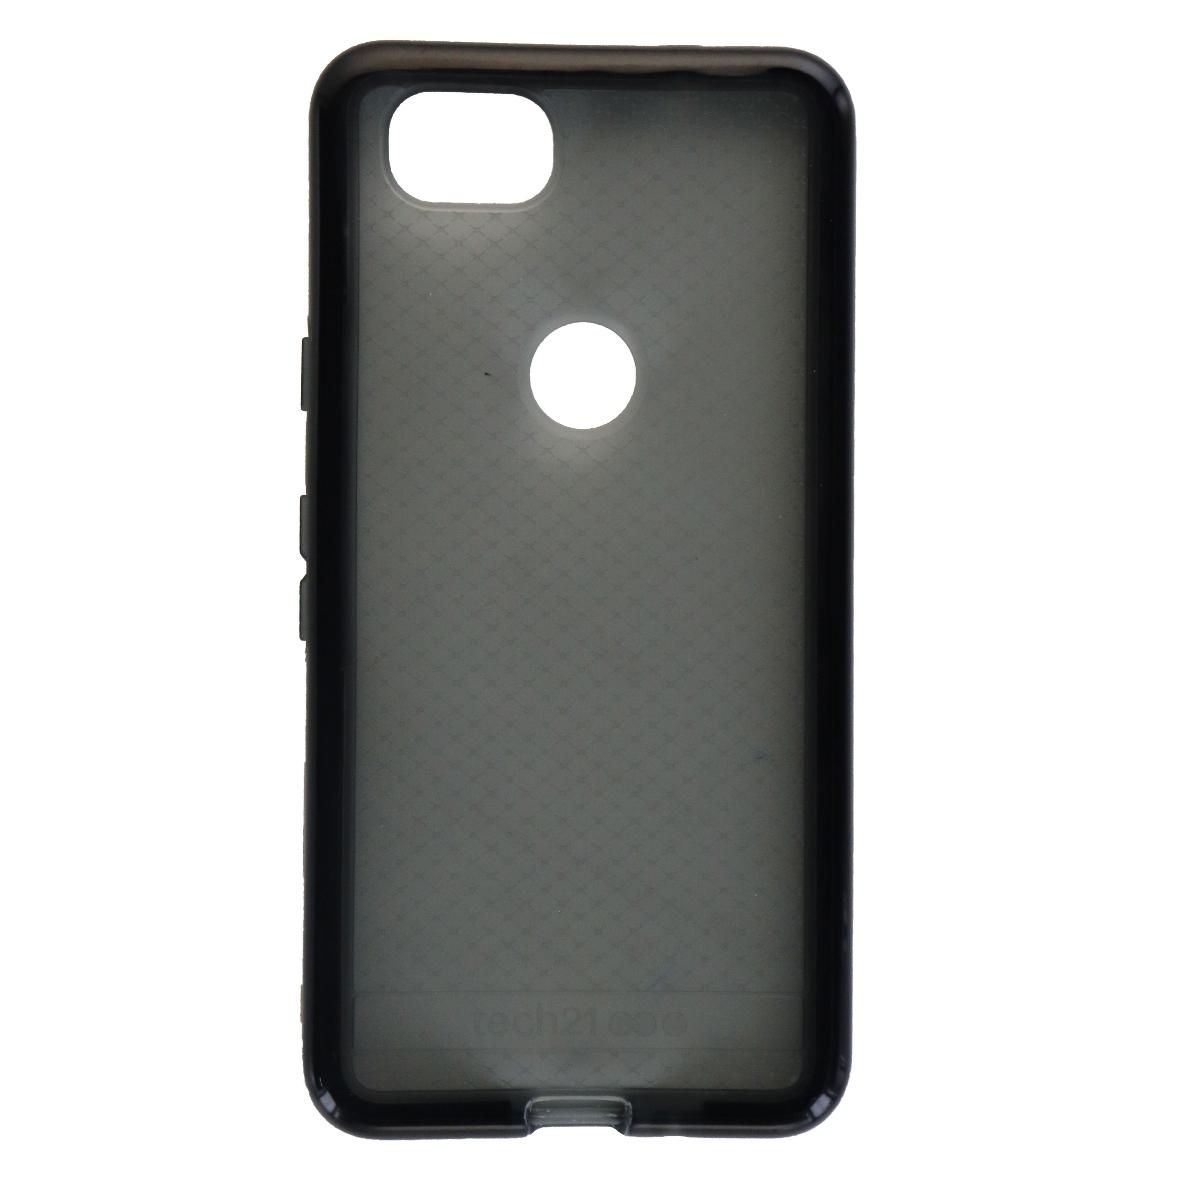 Tech21 Evo Check Series Protective Gel Case for Google Pixel 2 - Smokey/Black